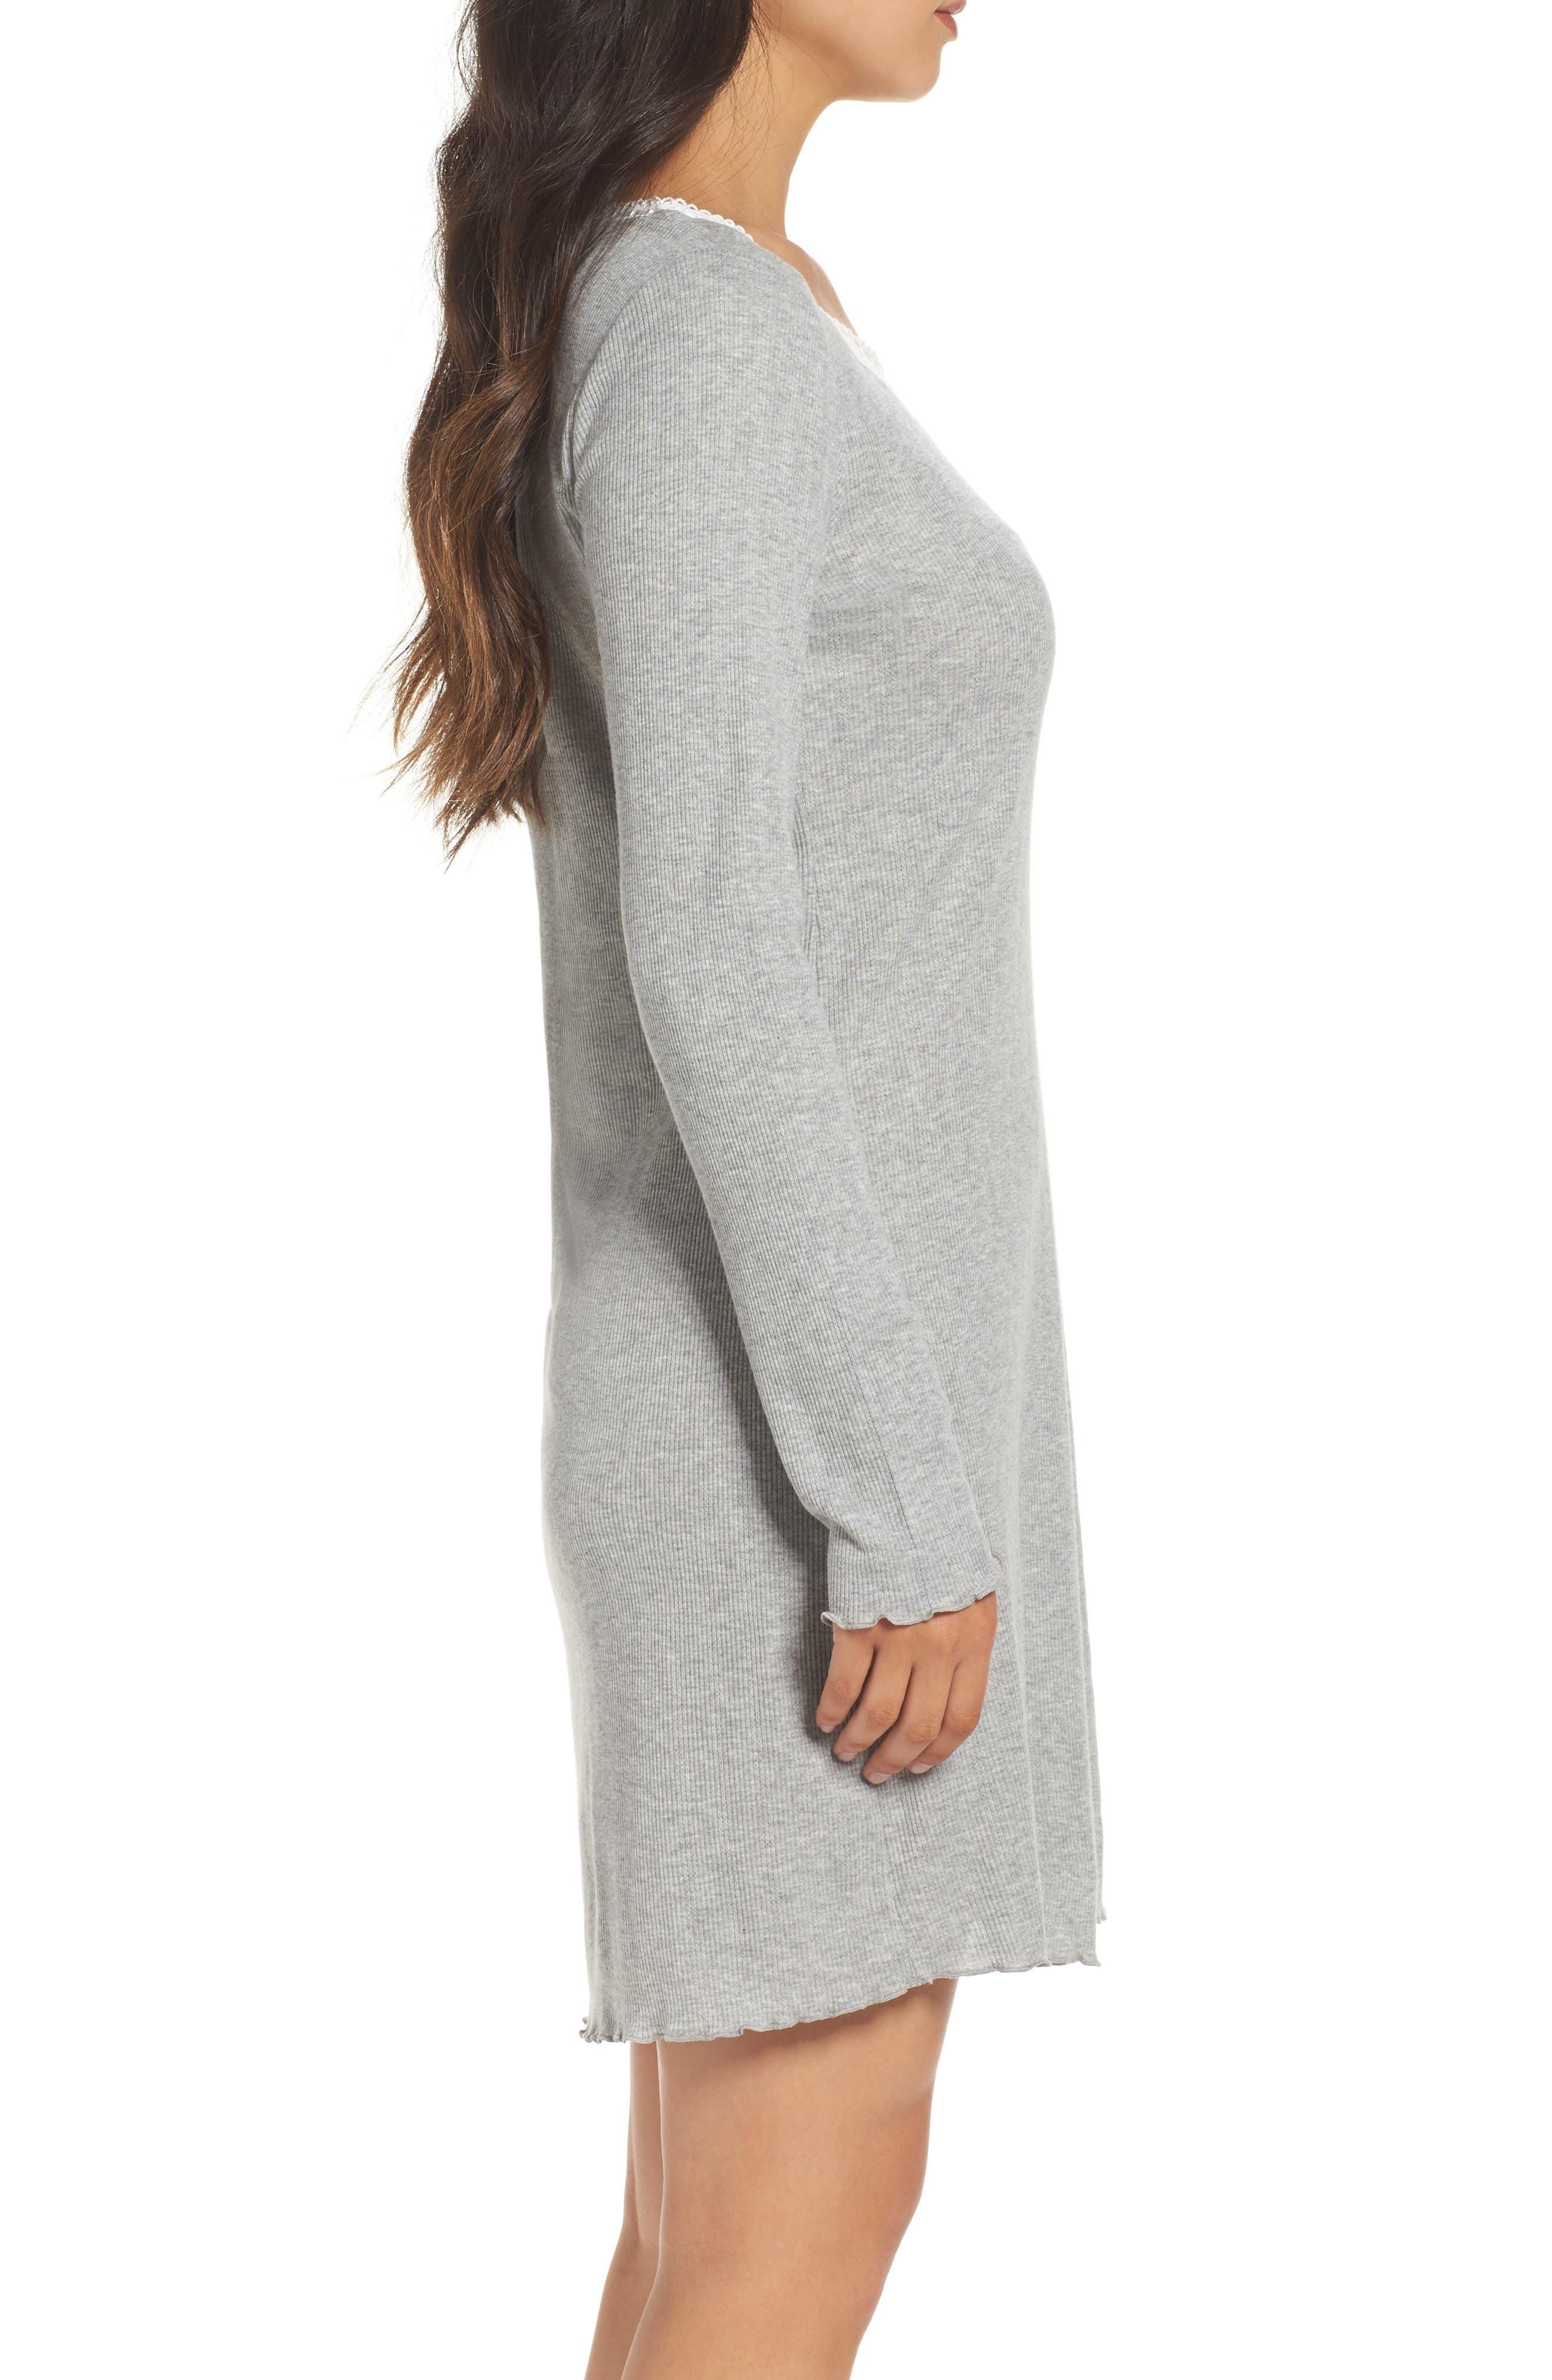 Lace Neck Sleep Shirt,                             Alternate thumbnail 3, color,                             022